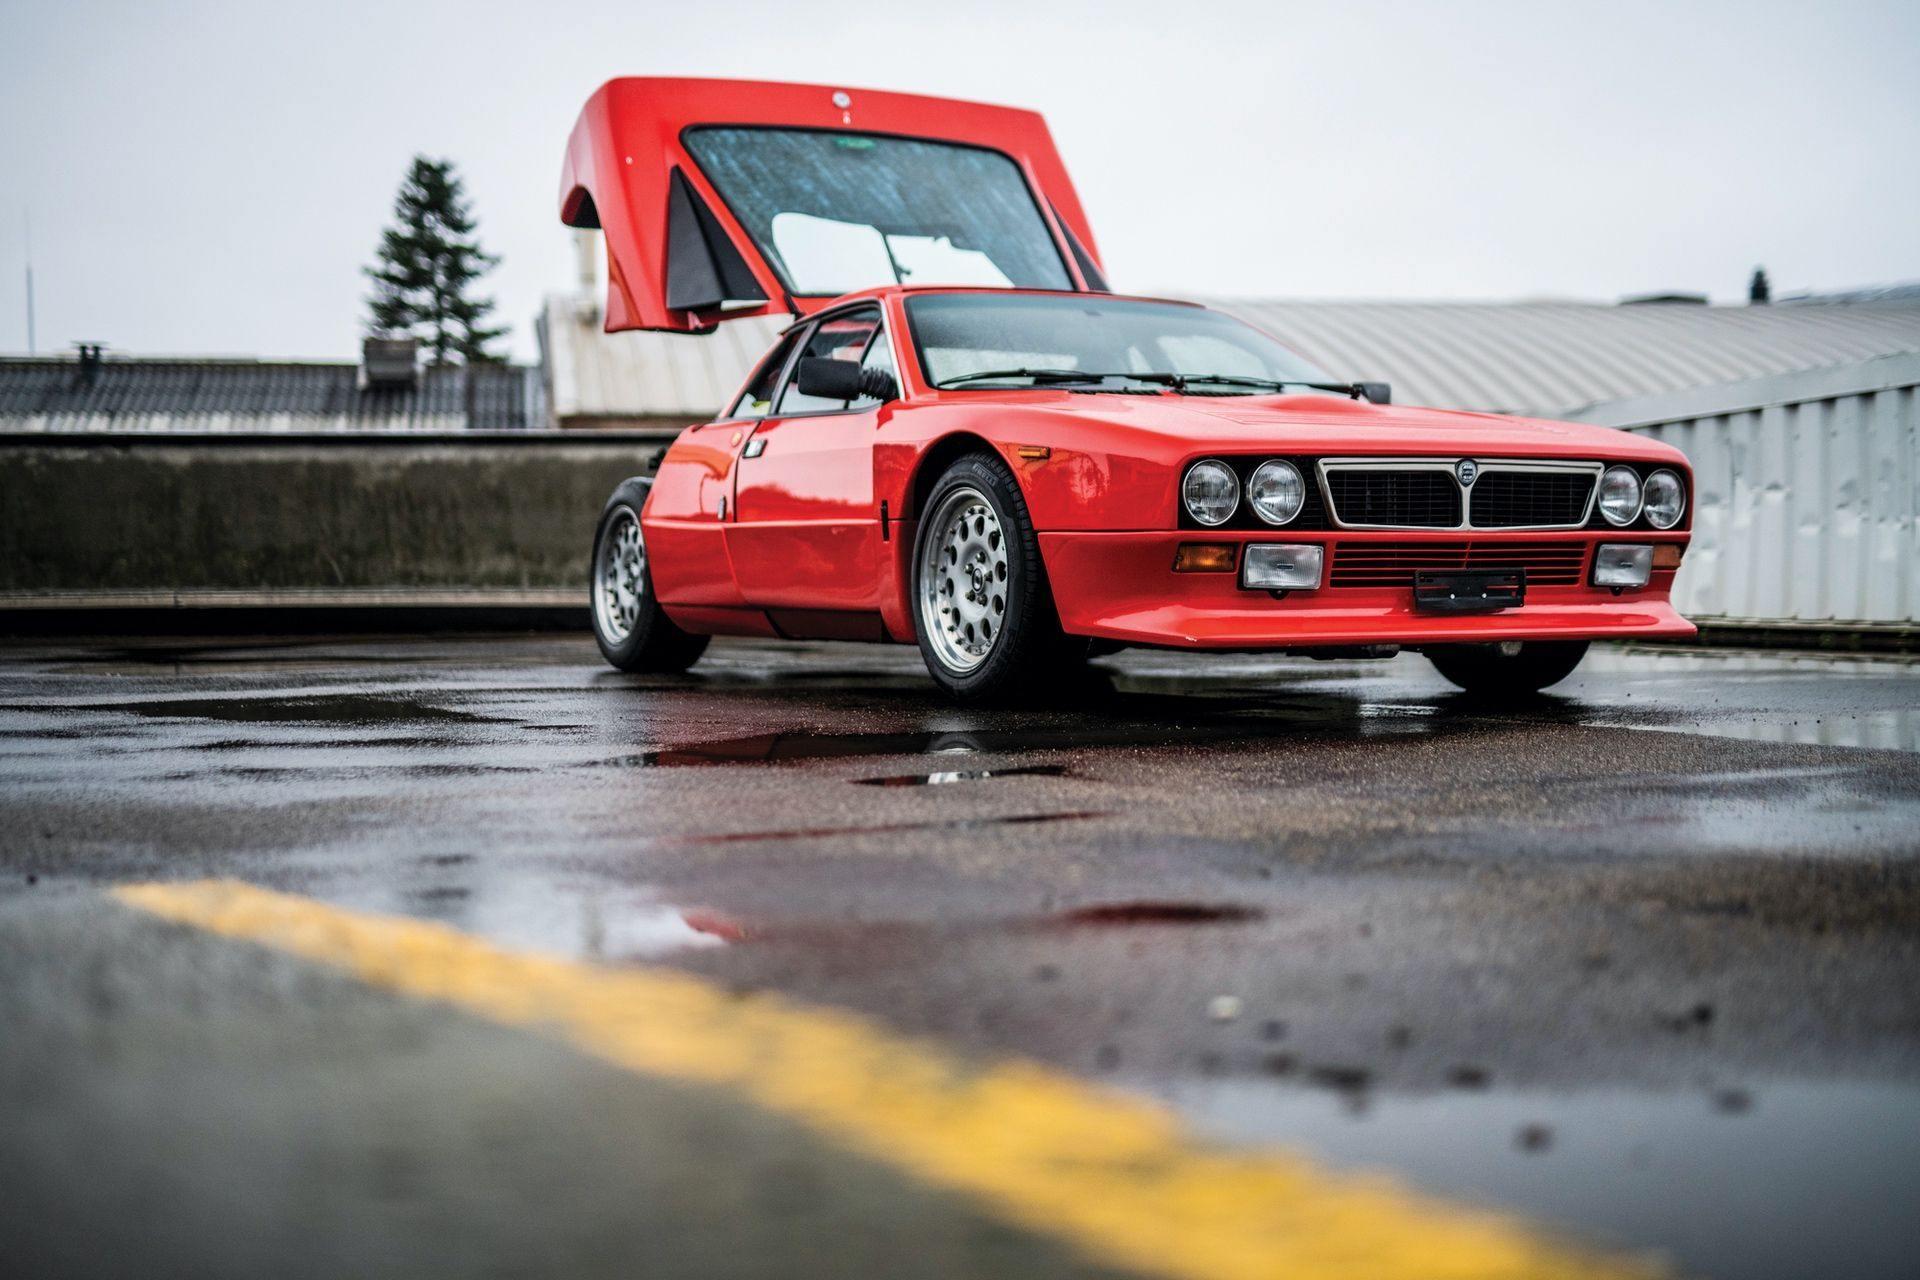 1981_Lancia_037_Stradale_sale_0008